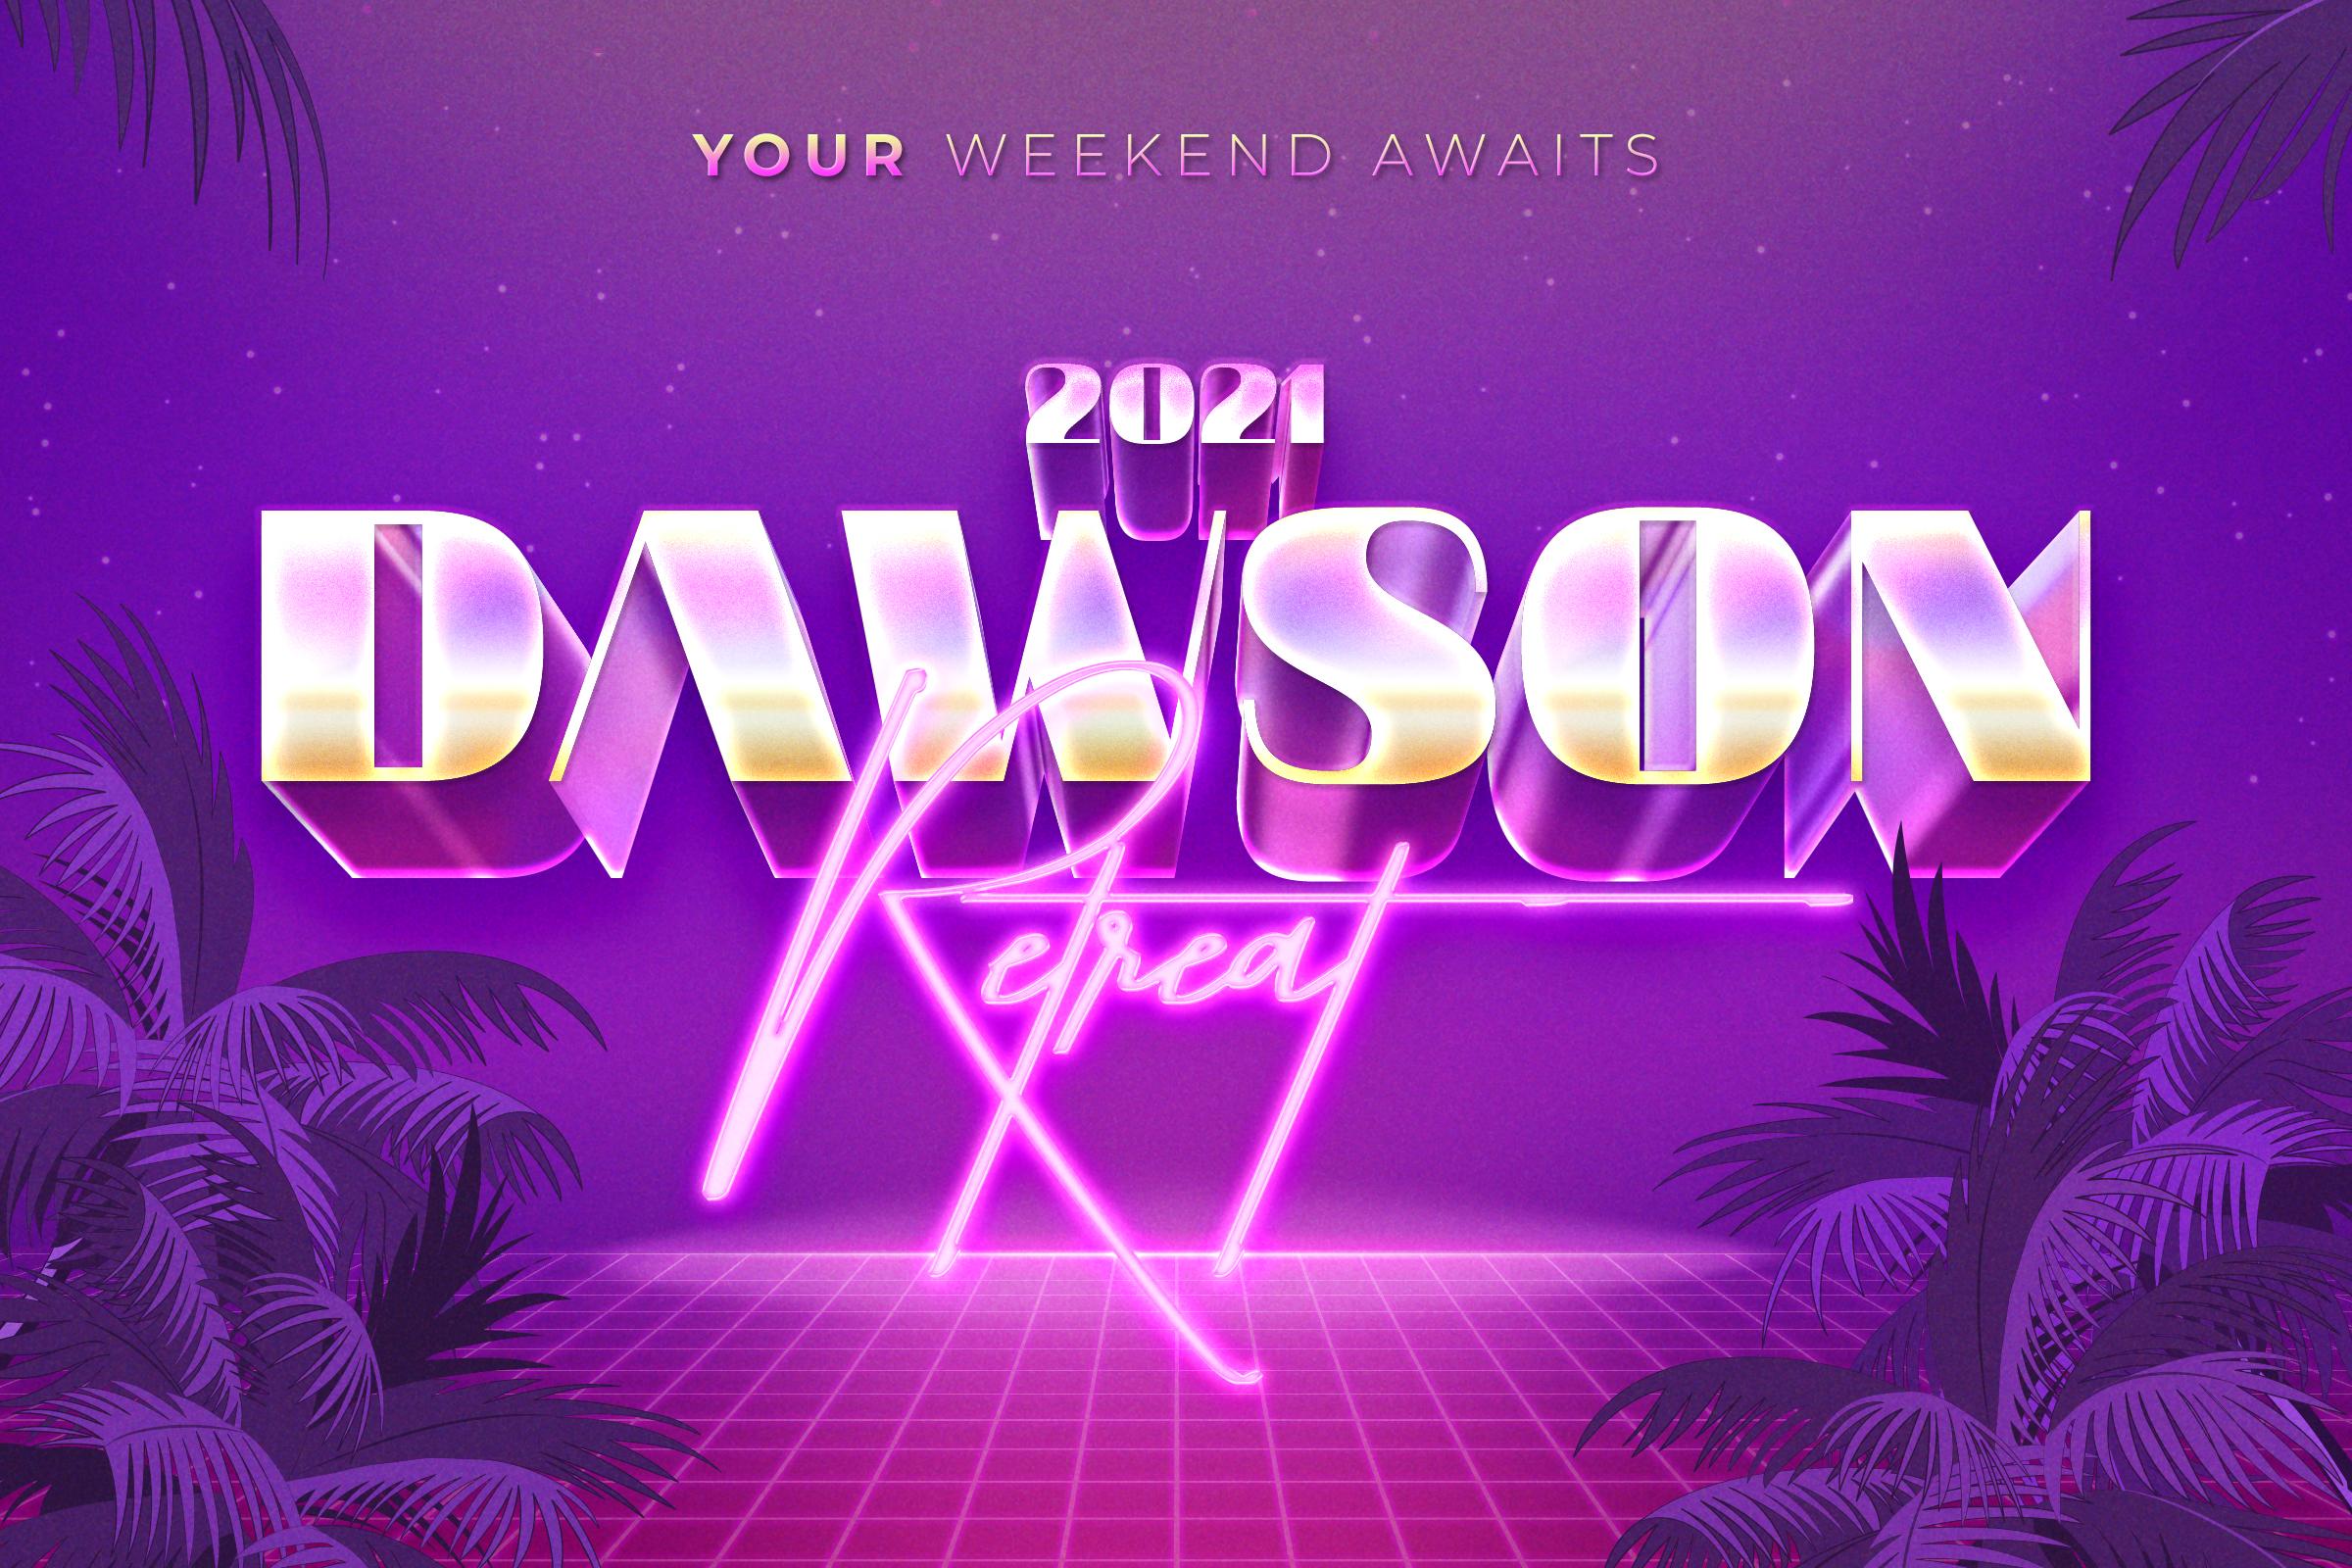 The 2021 Dawson Retreat